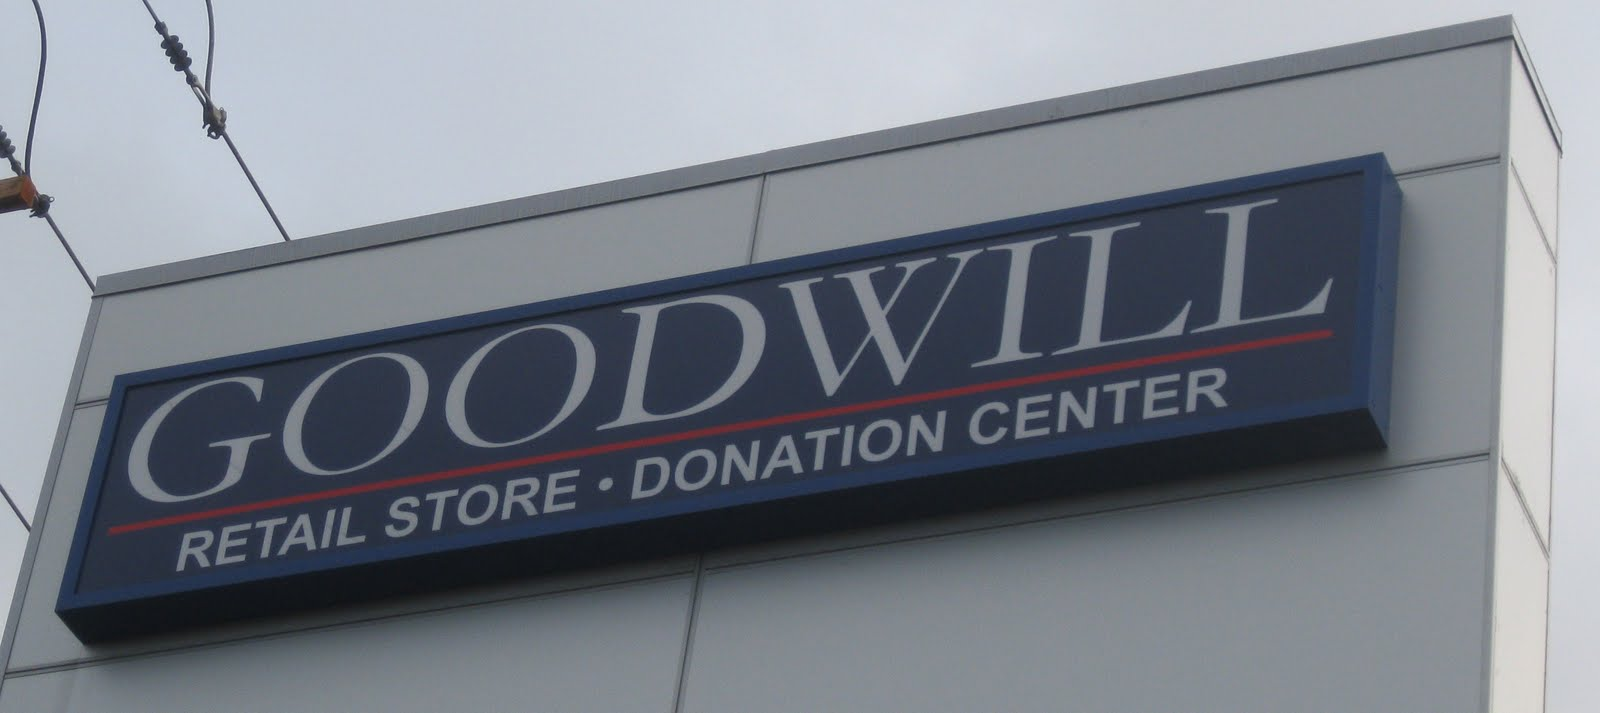 Goodwill Deals Ihop Online Coupon Codes